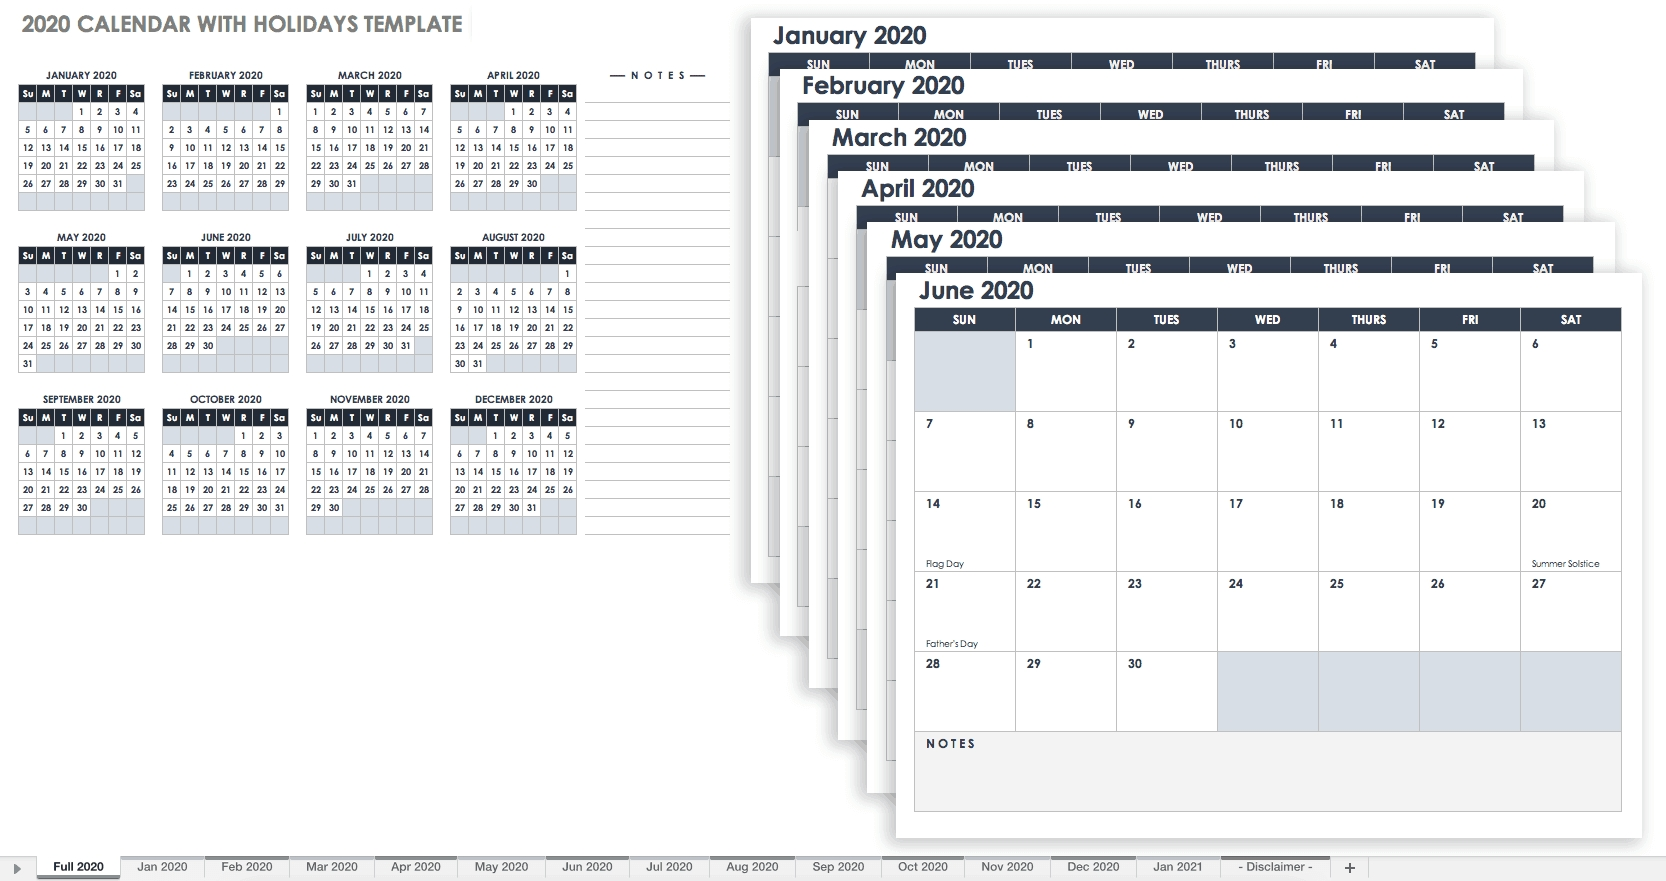 Free Google Calendar Templates | Smartsheet-Google Sheets Monthly Calendar Template